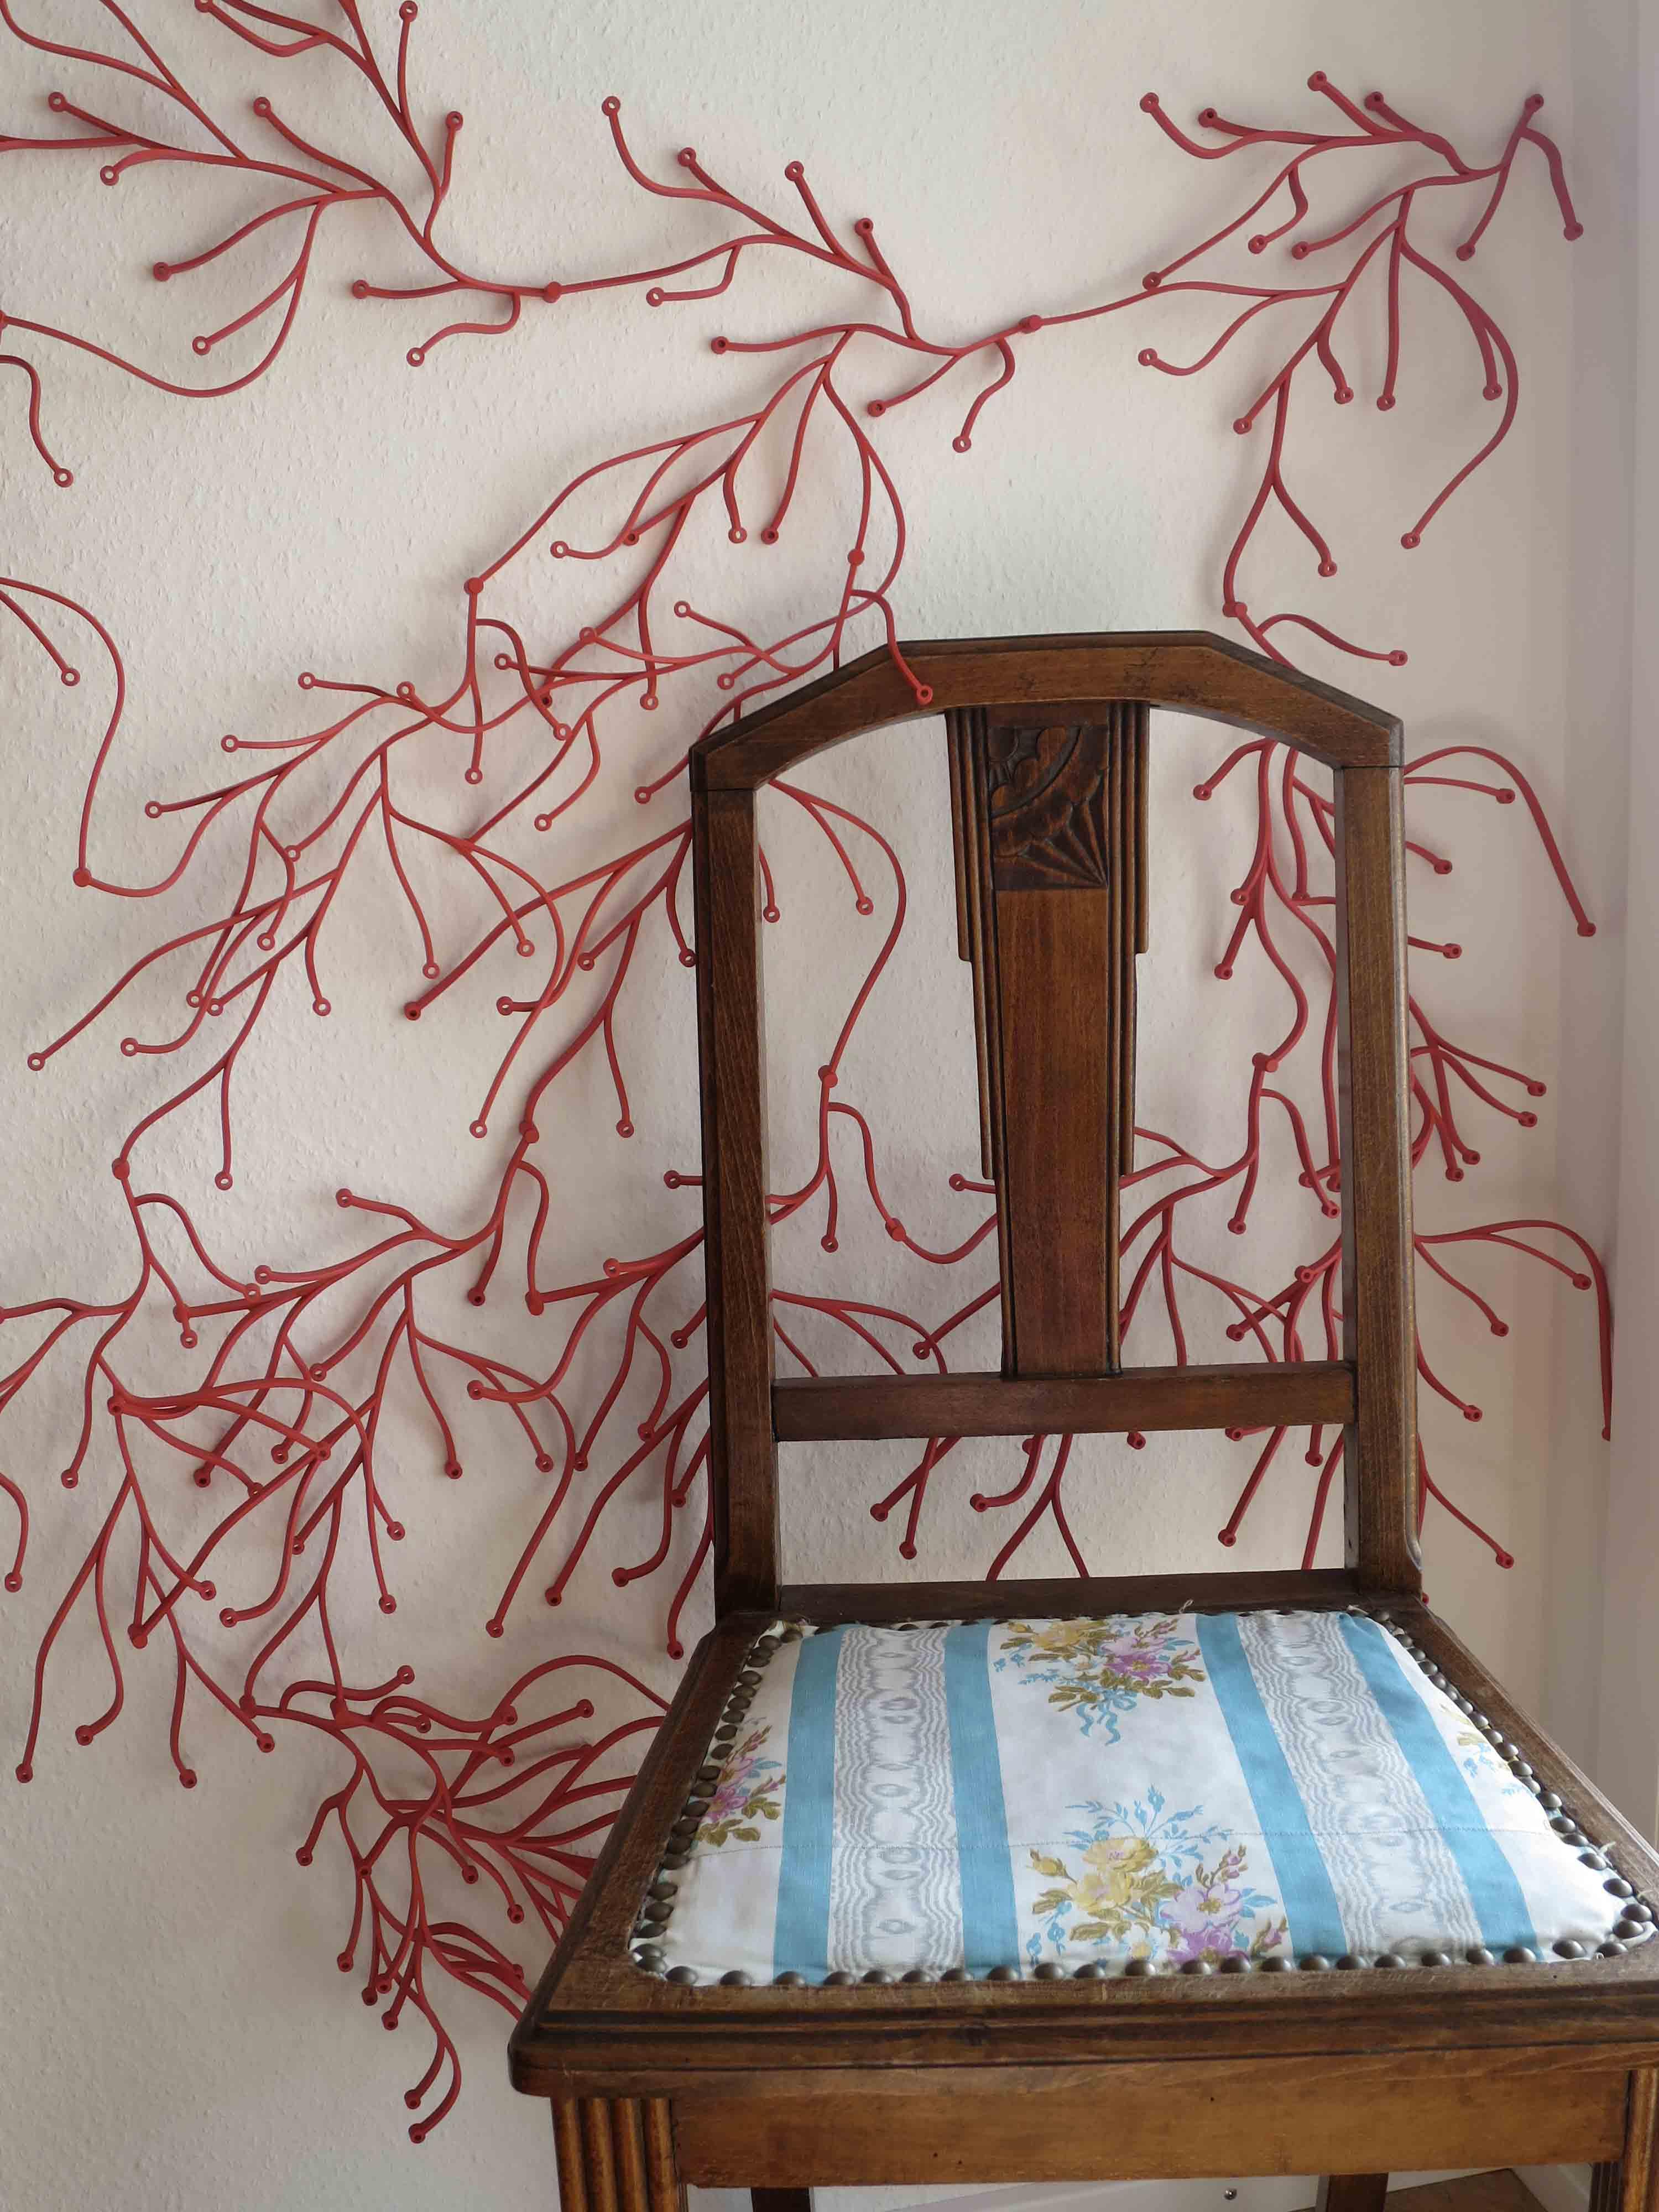 les algues des fr res bouroullec. Black Bedroom Furniture Sets. Home Design Ideas